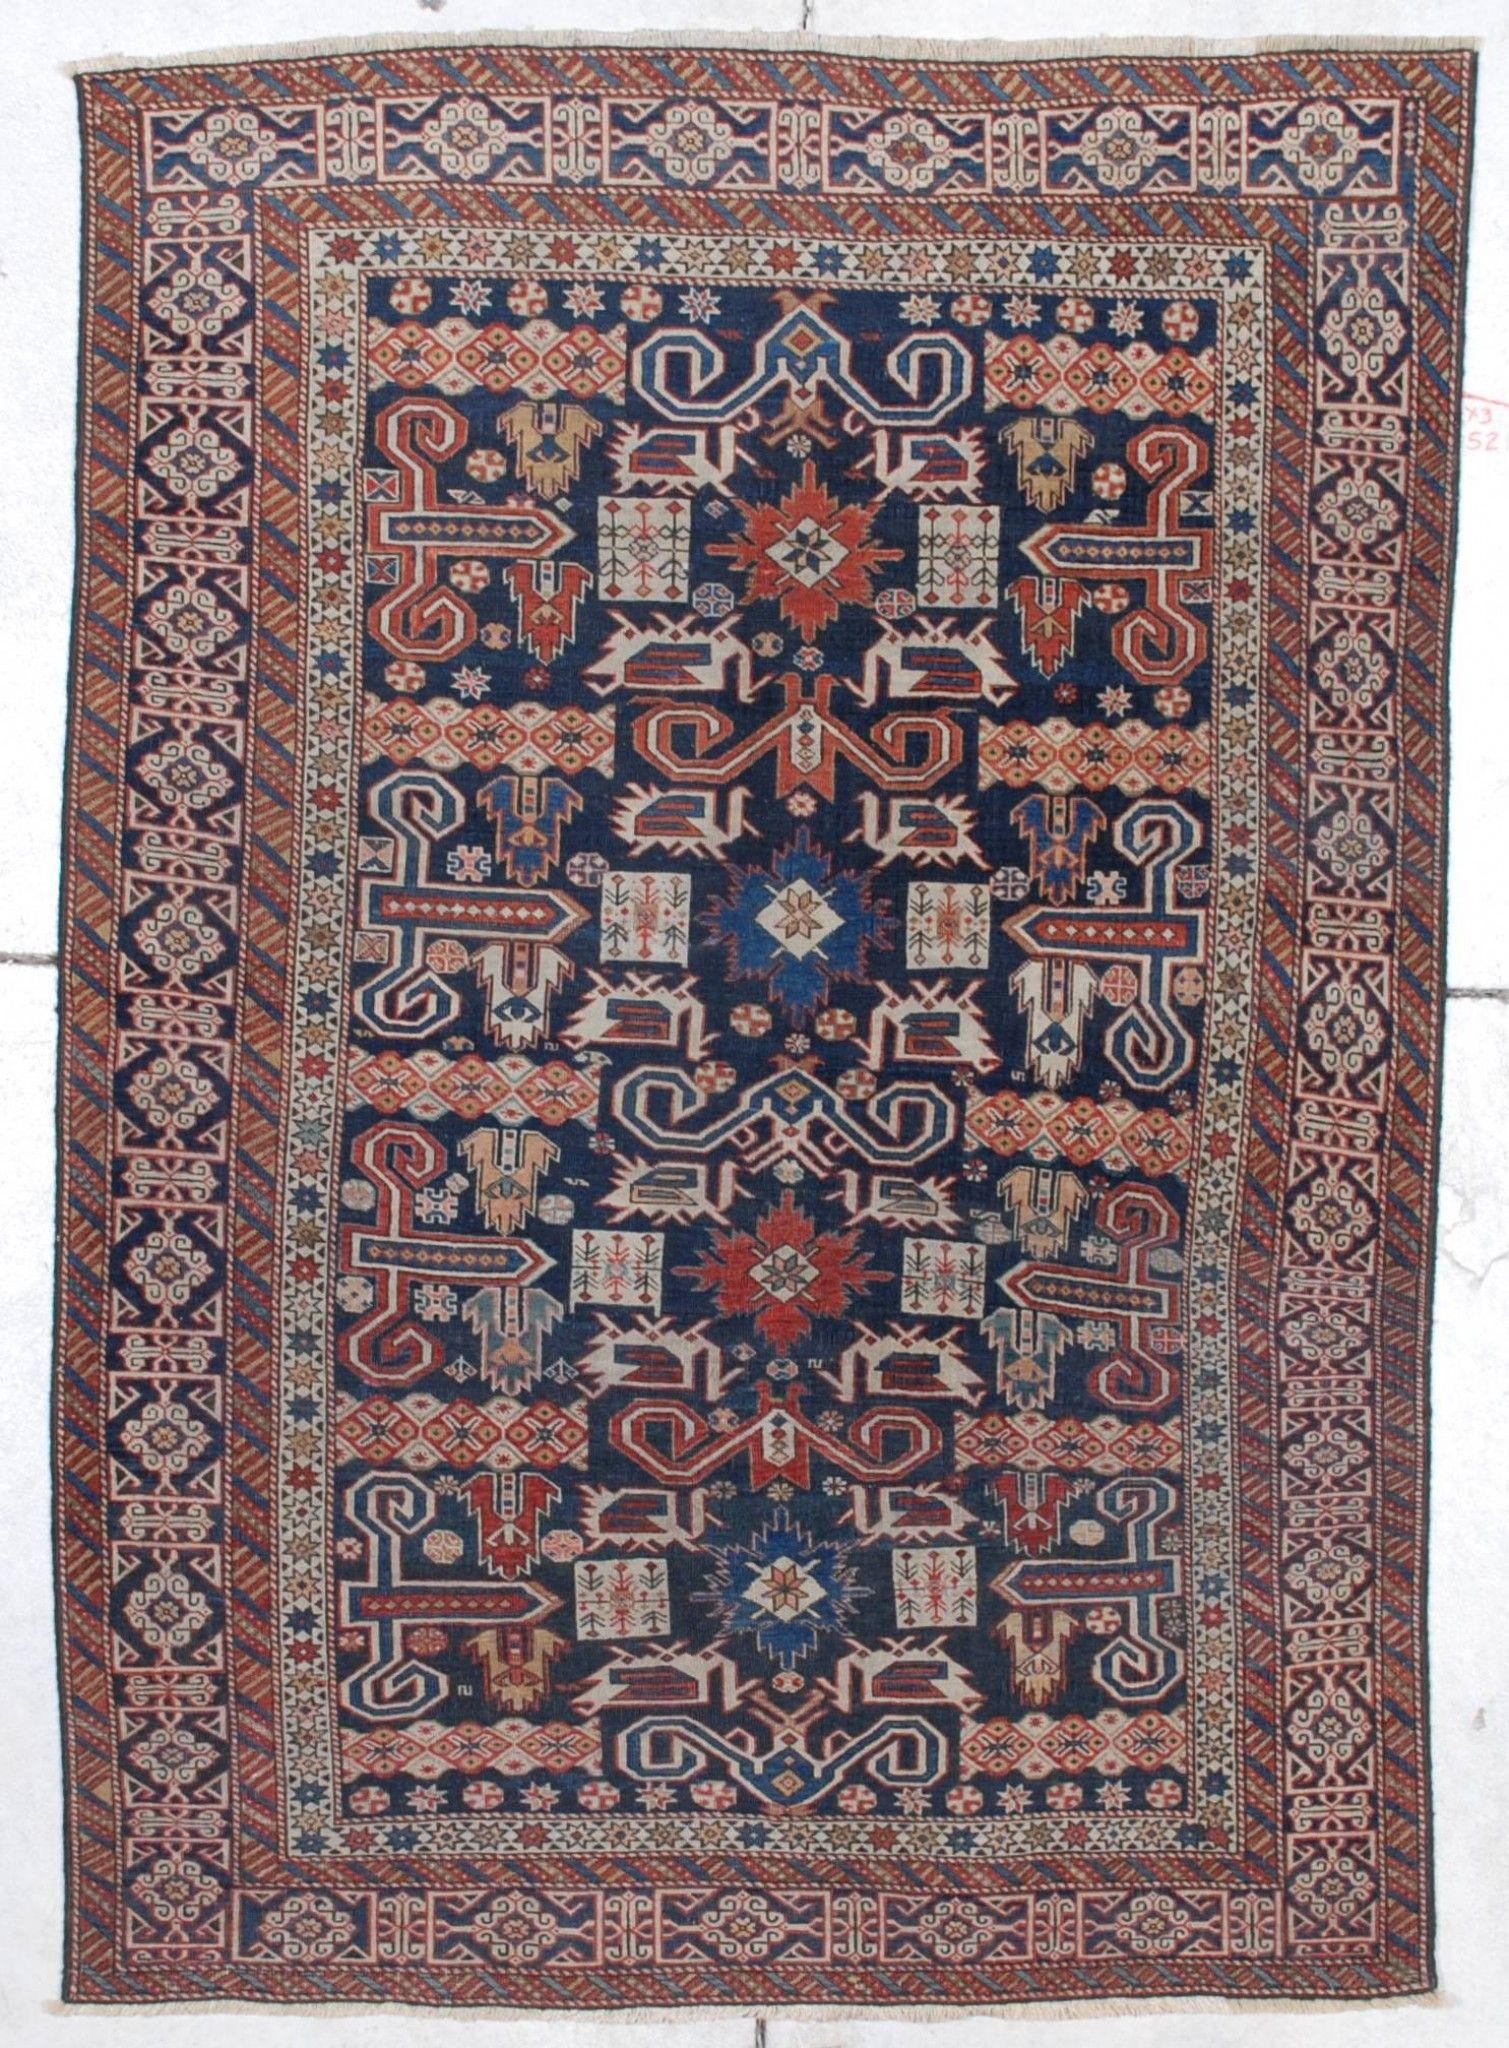 dla pinterest rugs types design best zapytania obrazy bidjar images of on carpet antique nazmiyal znalezione rug schemes carpets persian oriental